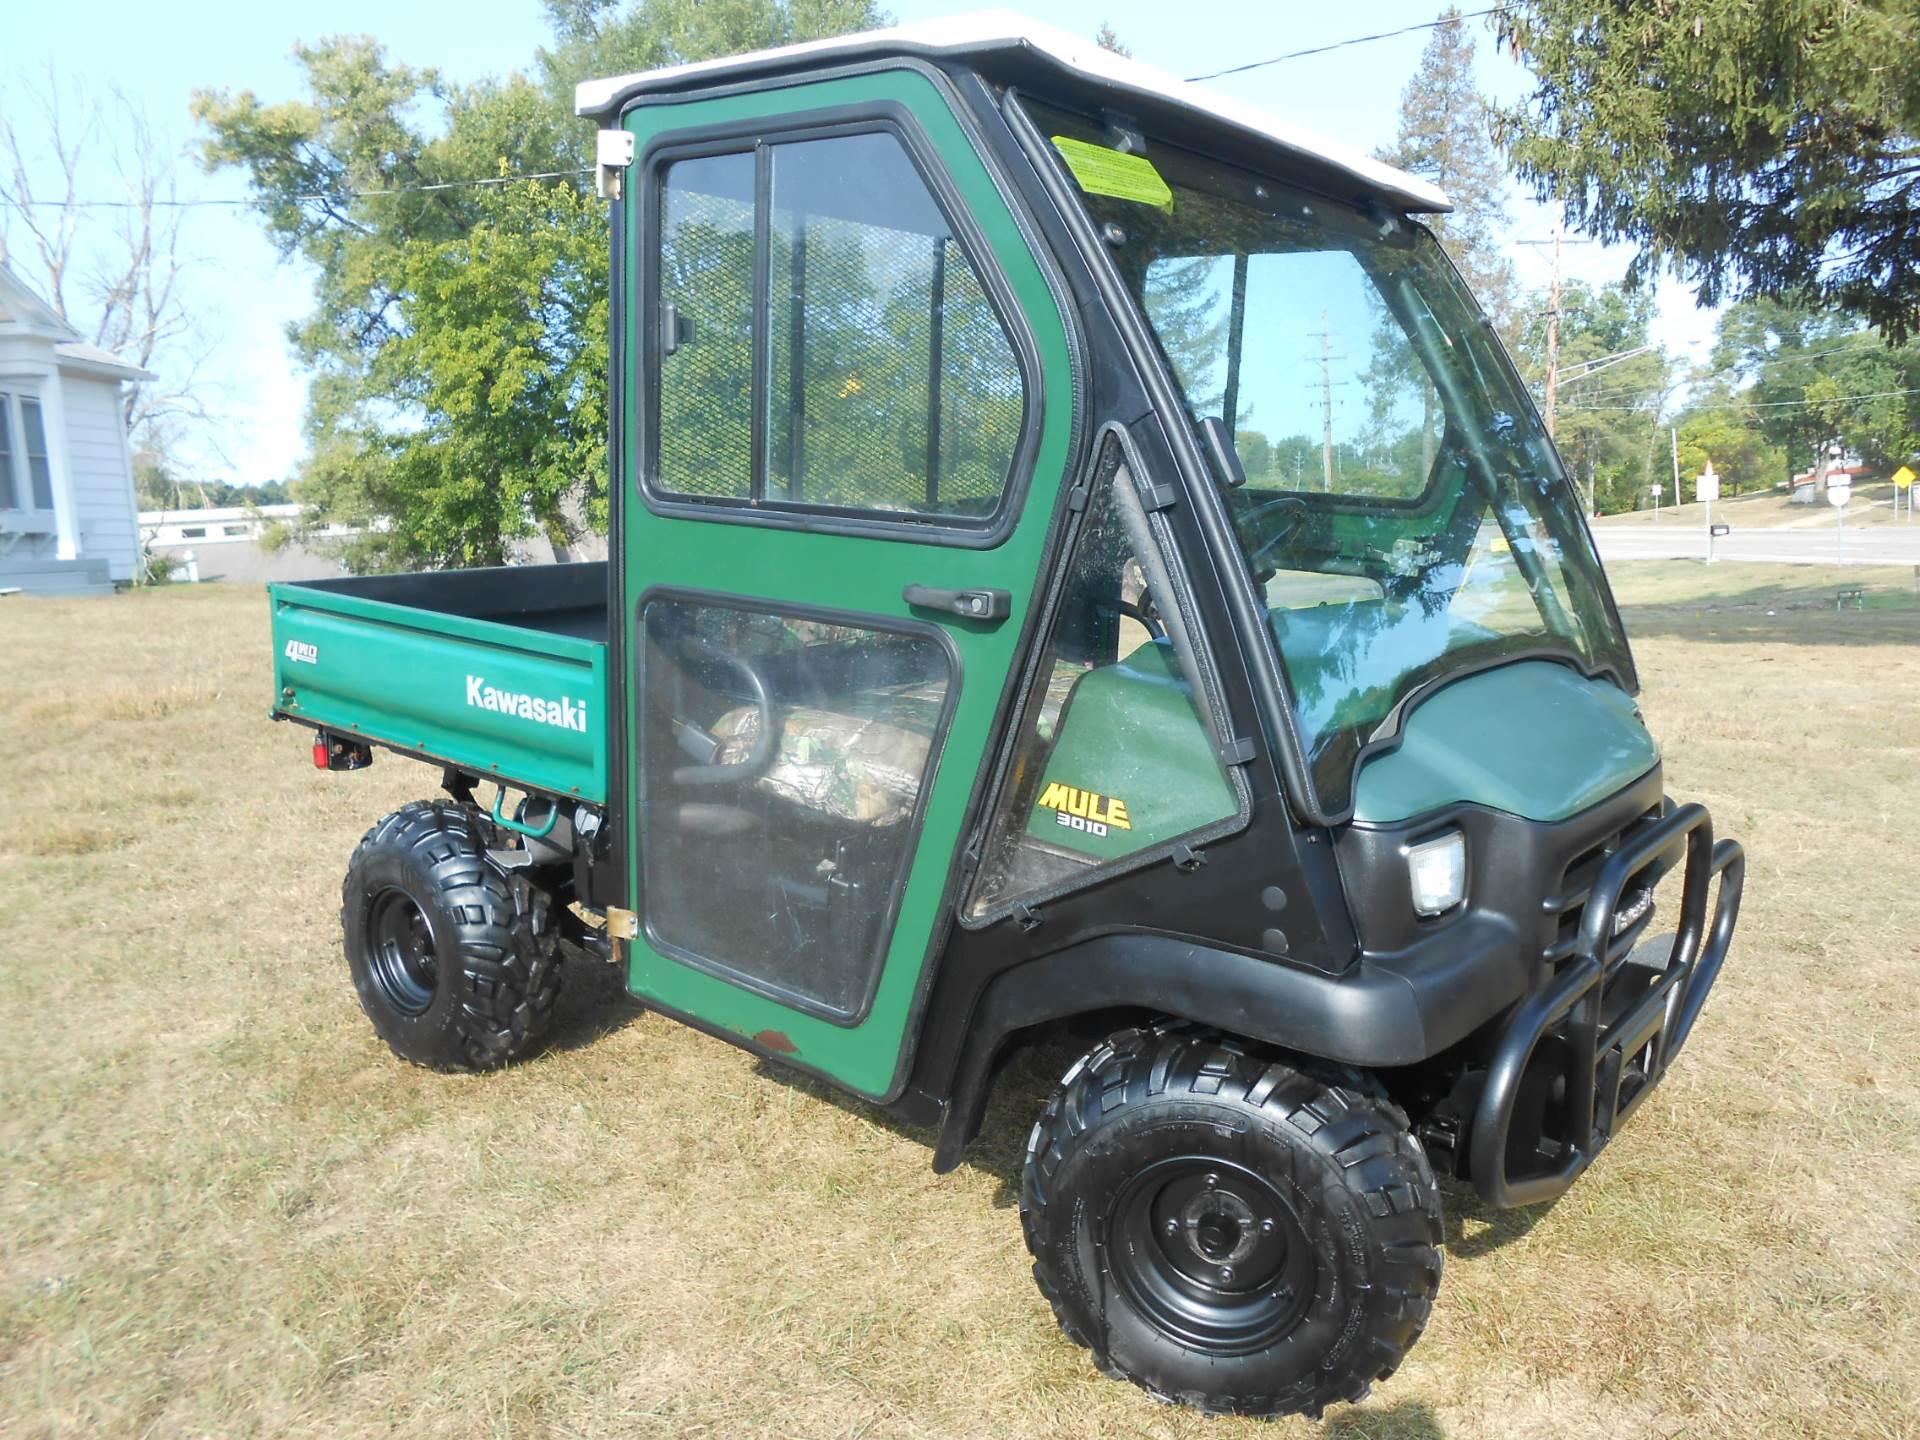 Kawasaki Mule 3010 Fuse Box Location – Kawasaki Mule 2500 Wiring Harness